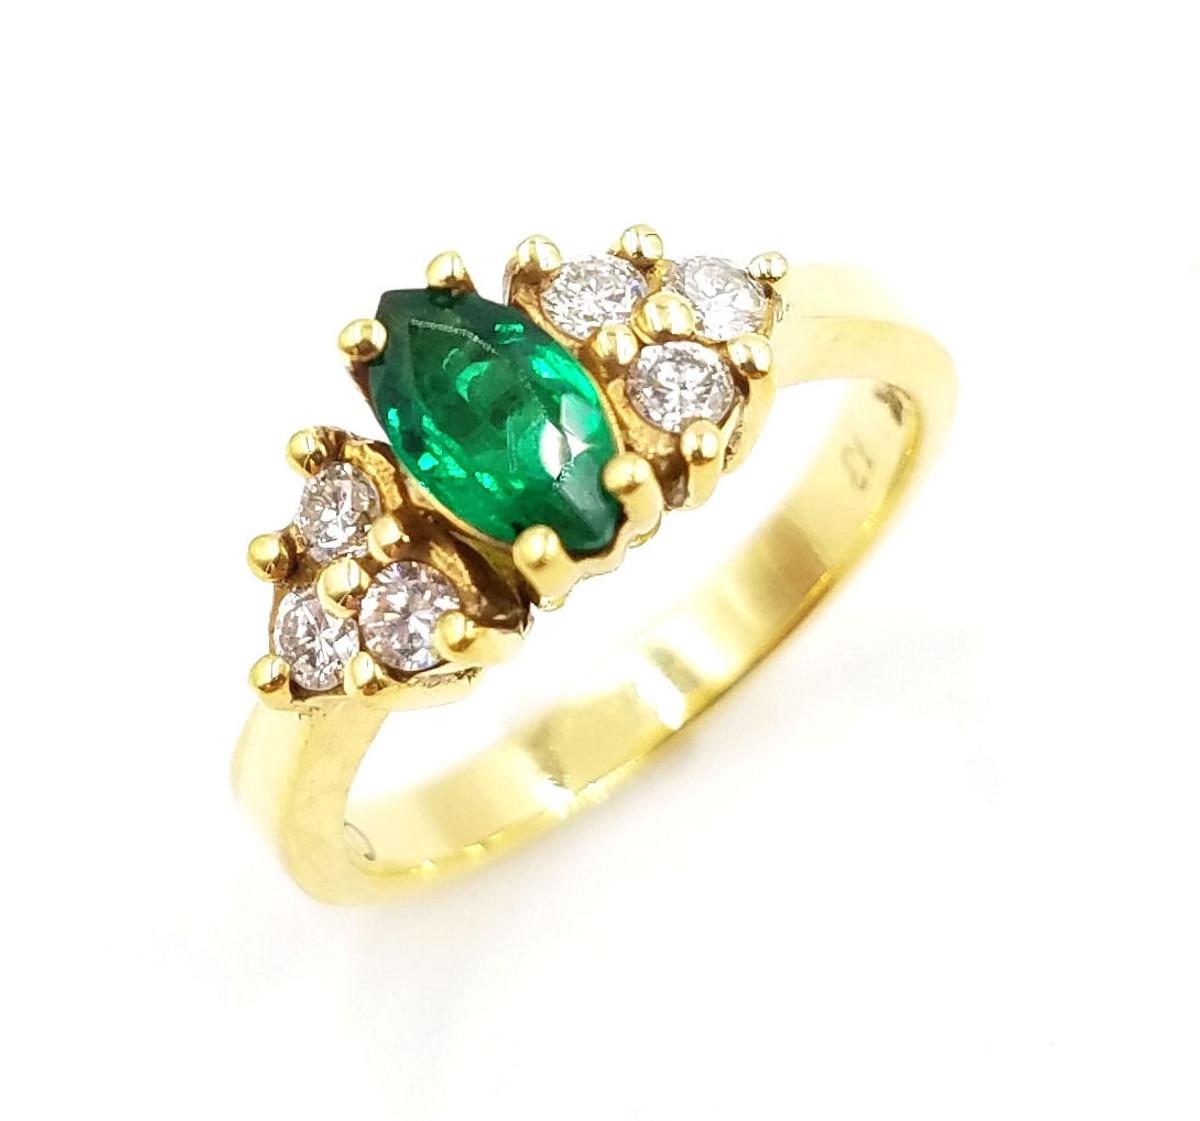 18kt yellow gold diamond & genuine emerald ring